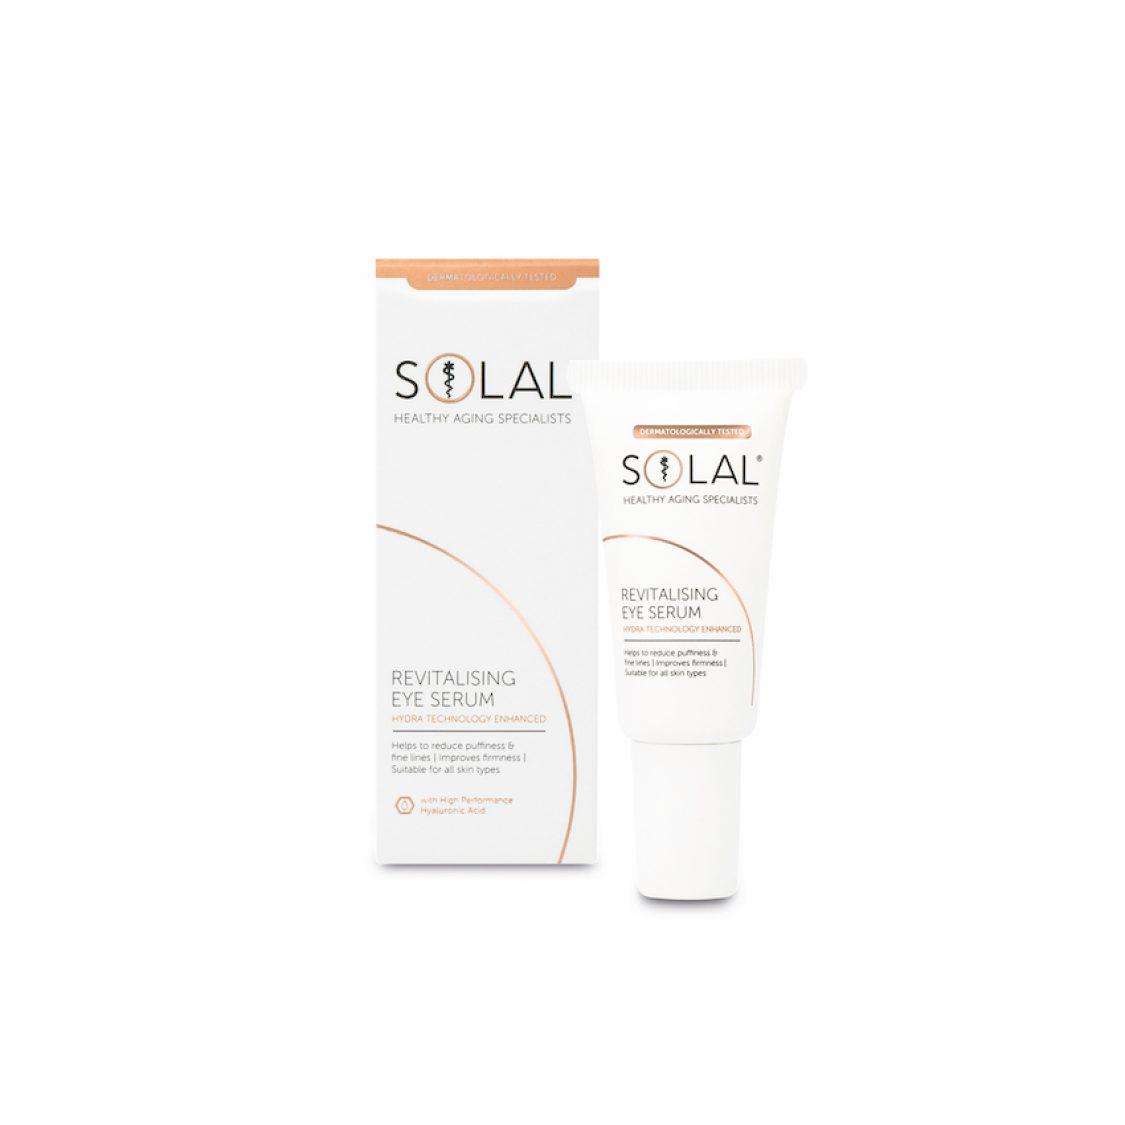 Solal - Revitalising Eye Serum 15ml